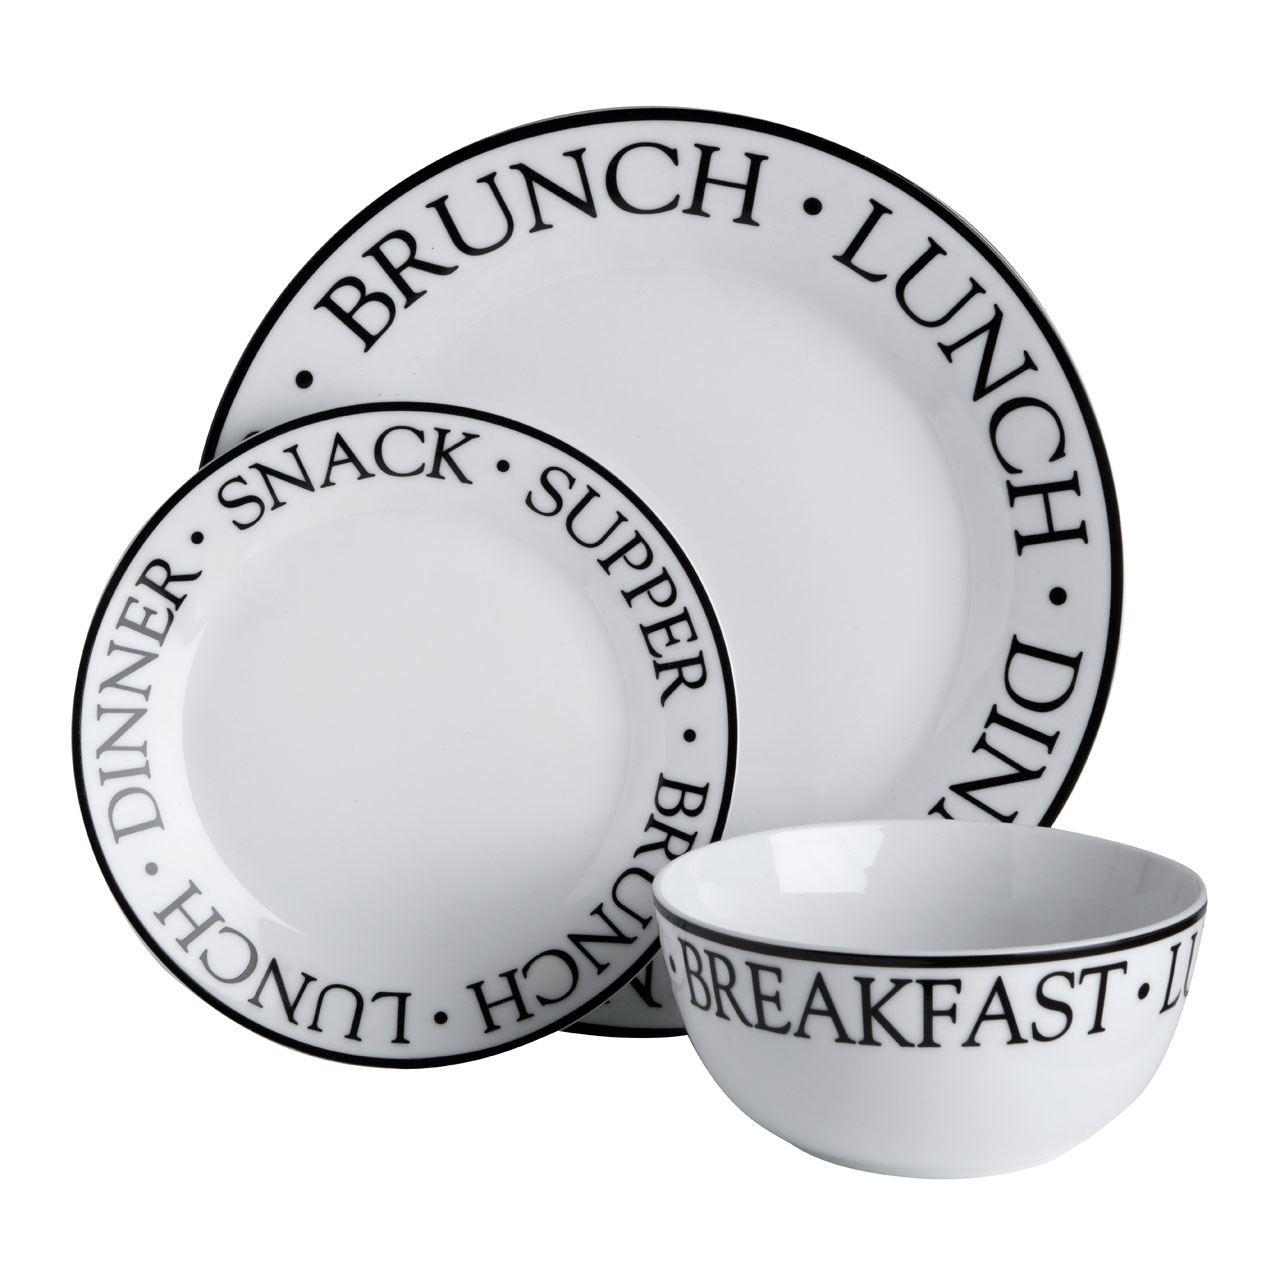 12-24-PCS-DINNER-SET-Porcelain-Kitchen-Serving-  sc 1 st  eBay & 12/24 PCS DINNER SET Porcelain Kitchen Serving Plates Bowls Set ...